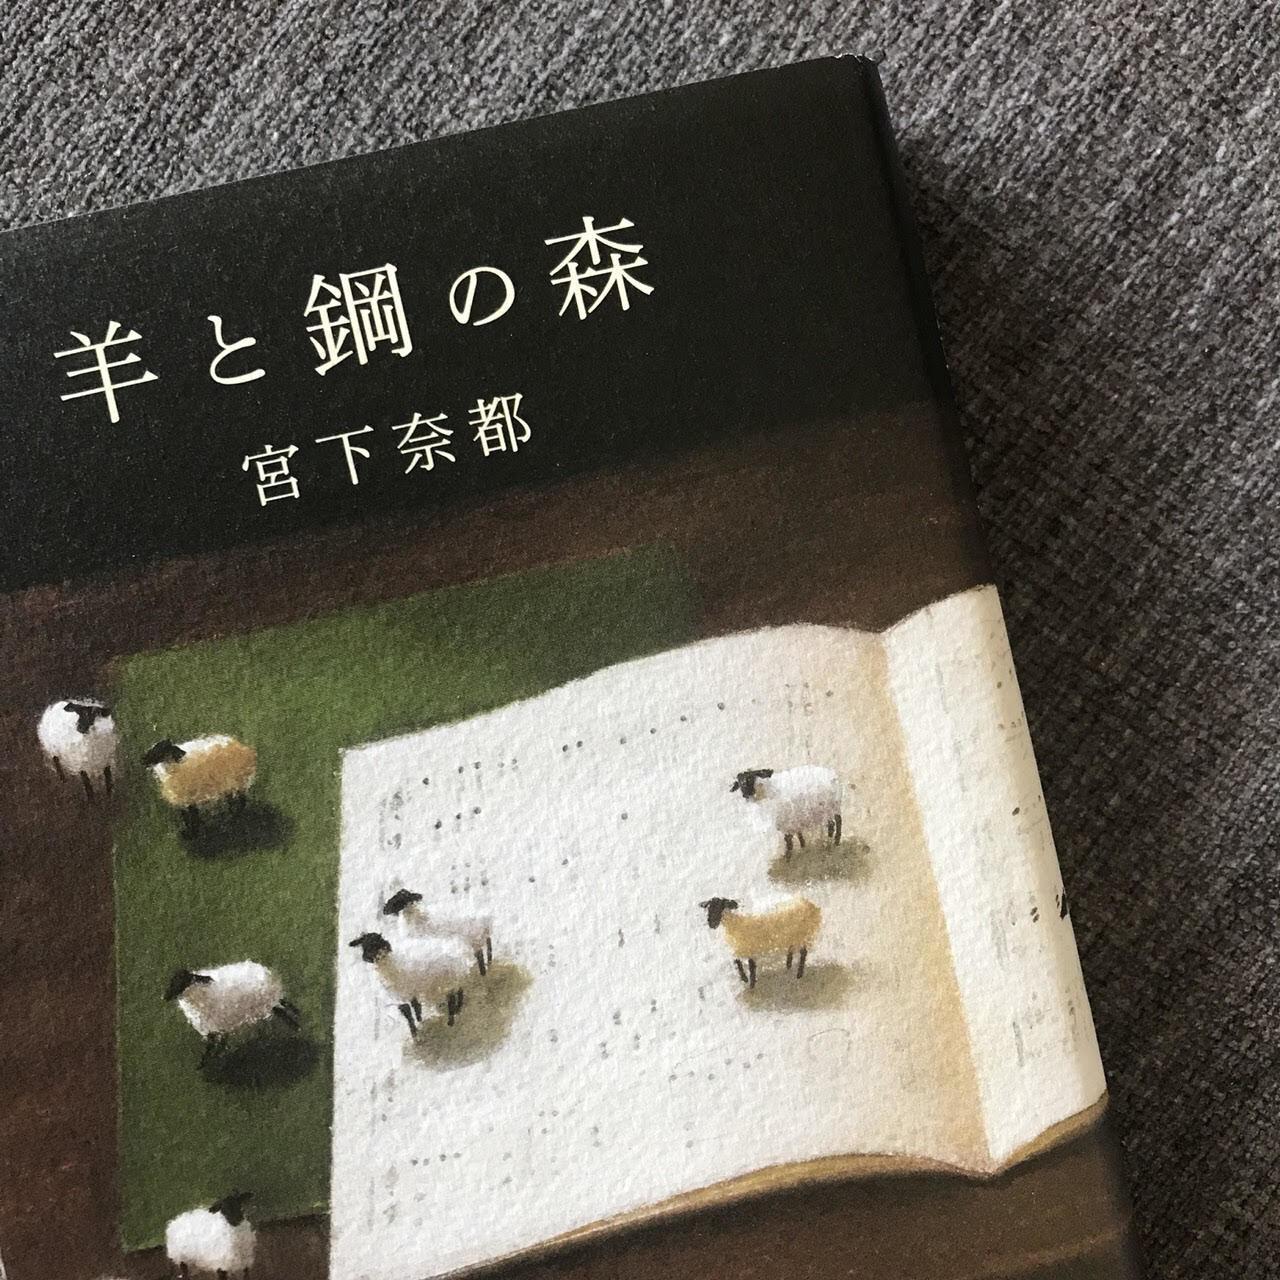 [富岡佳子private life]1人映画鑑賞_1_1